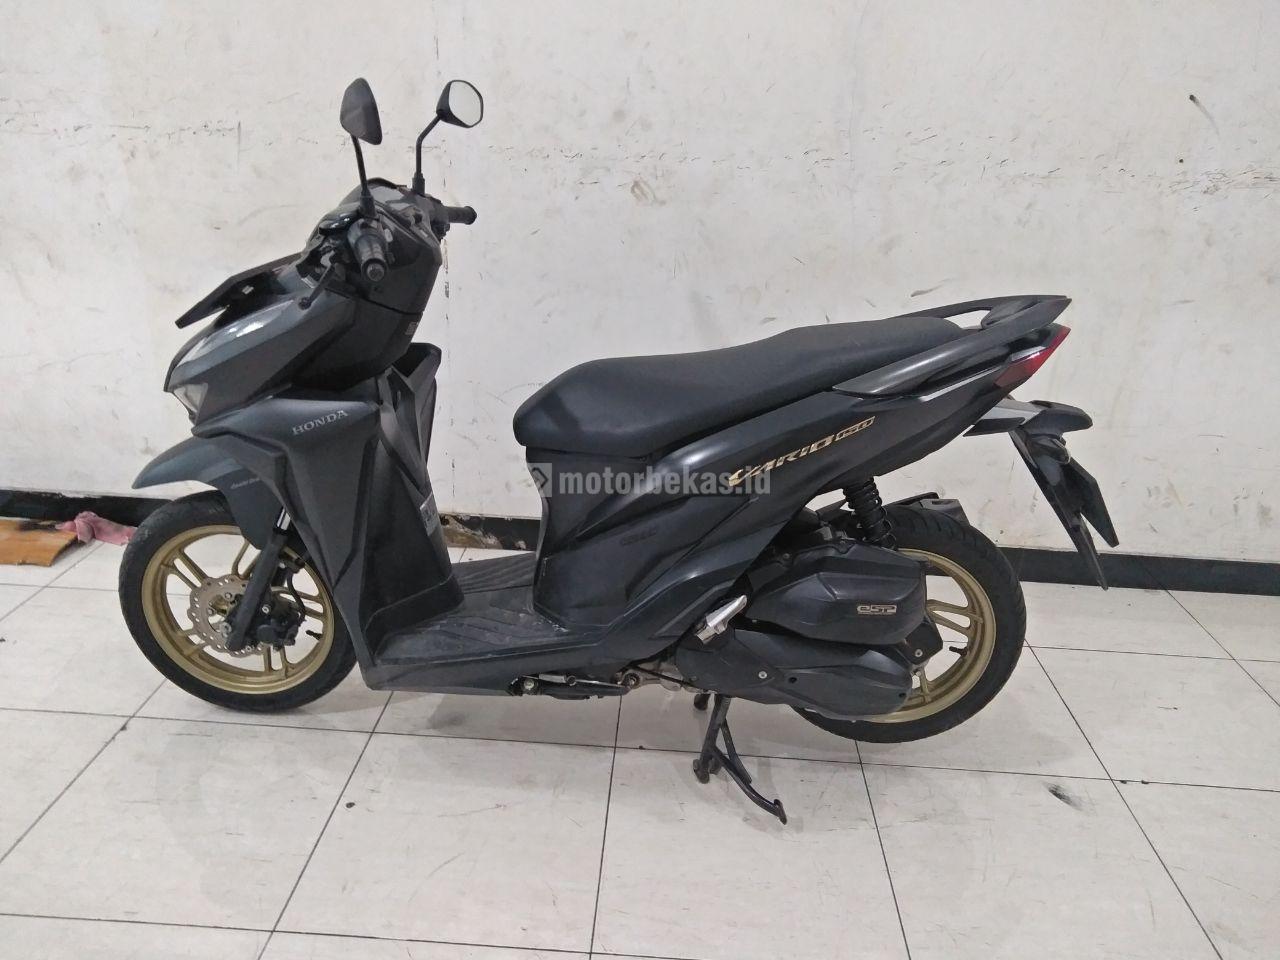 HONDA VARIO 150 SE  4000 motorbekas.id